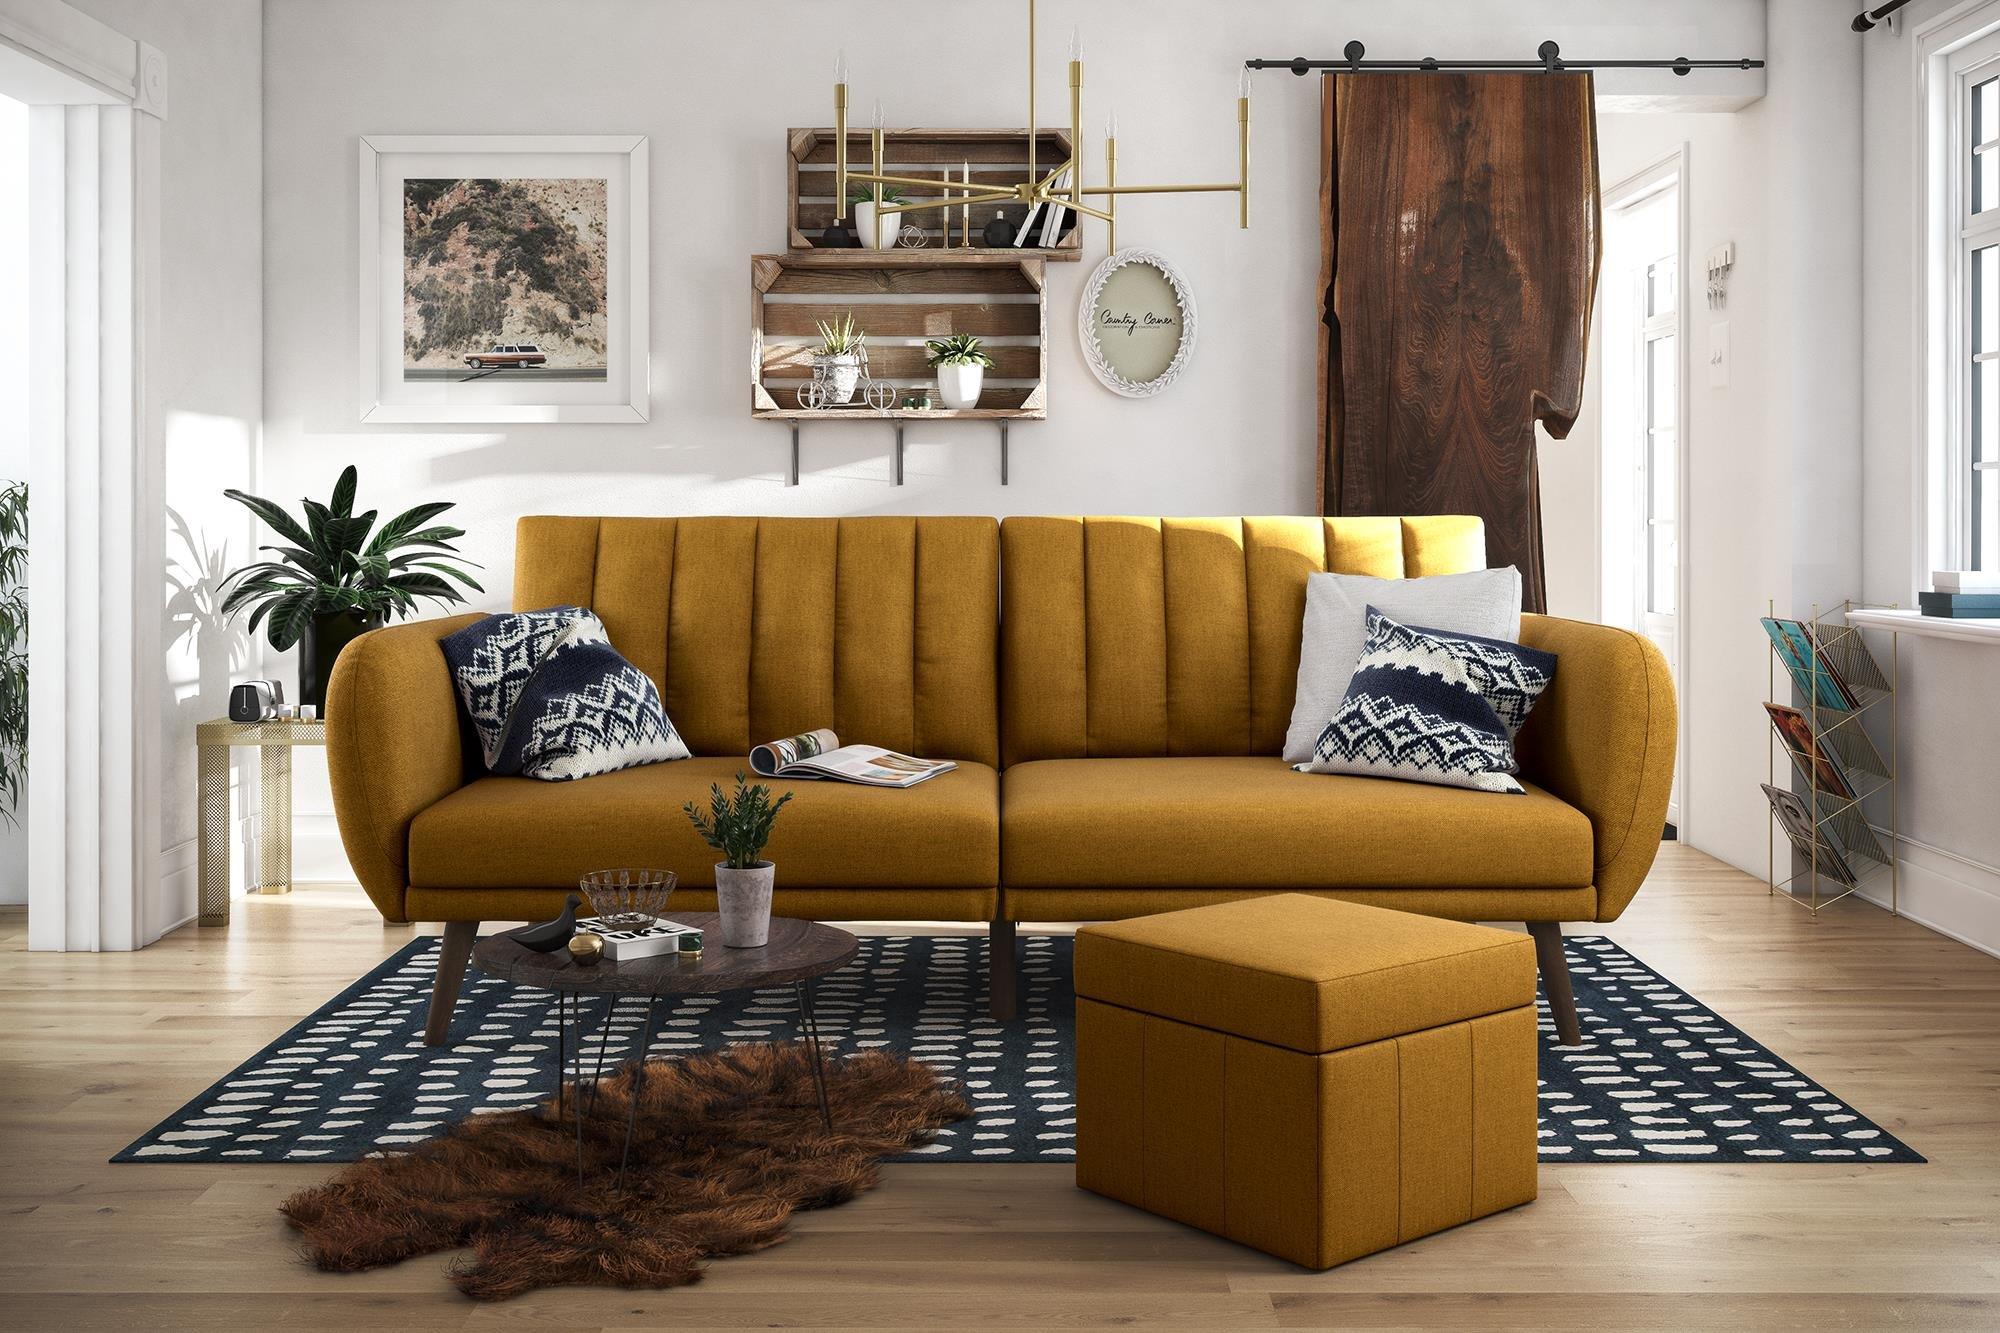 Novogratz Brittany Sofa Futon, Premium Linen Upholstery and Wooden Legs, Mustard Linen by Novogratz